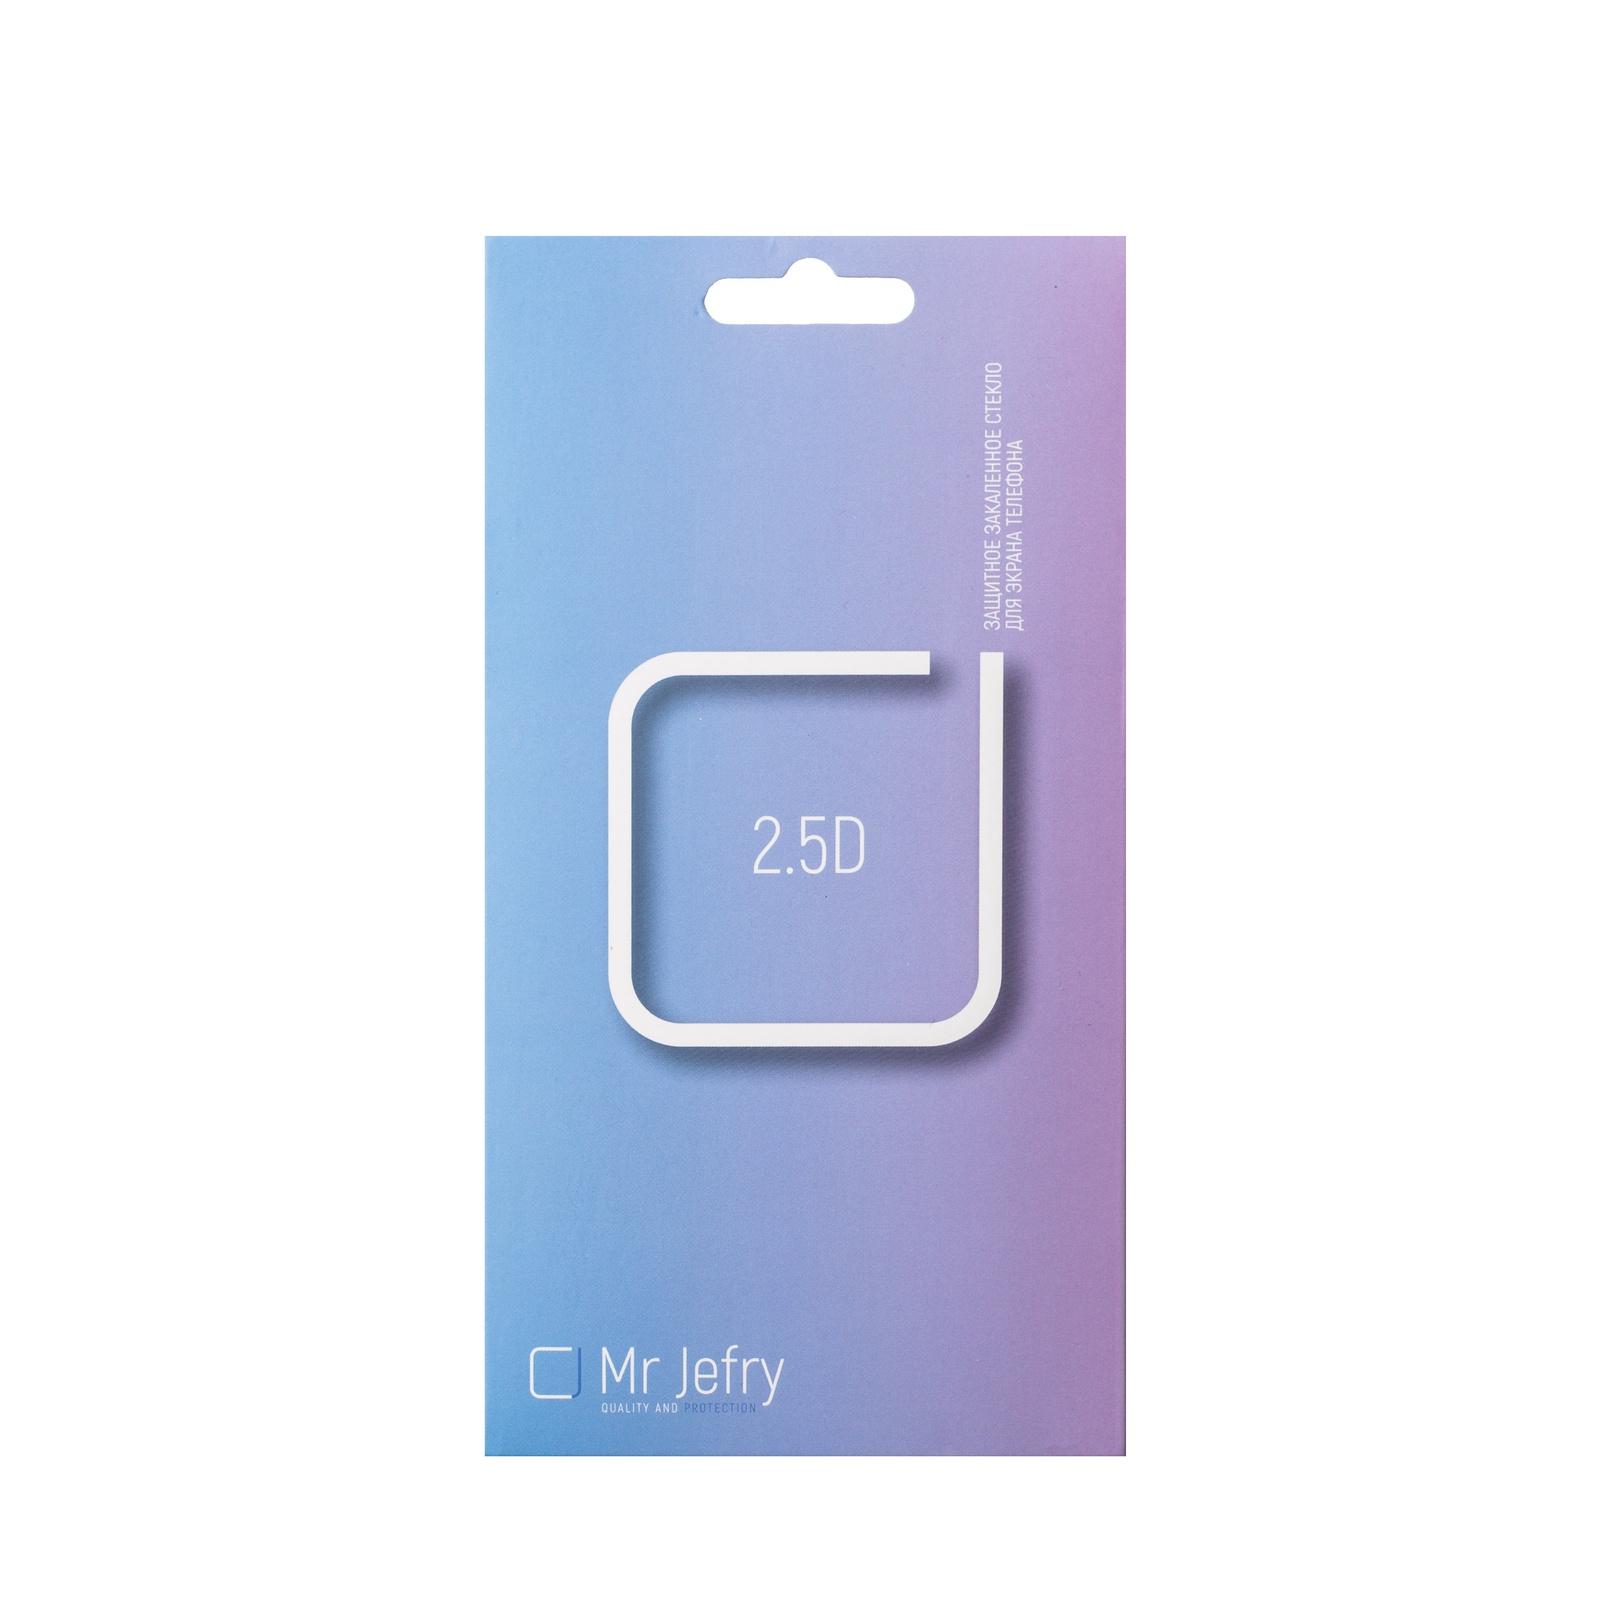 Mr Jefry стекло защитное (многослойное) 2,5D для Huawei Honor 10